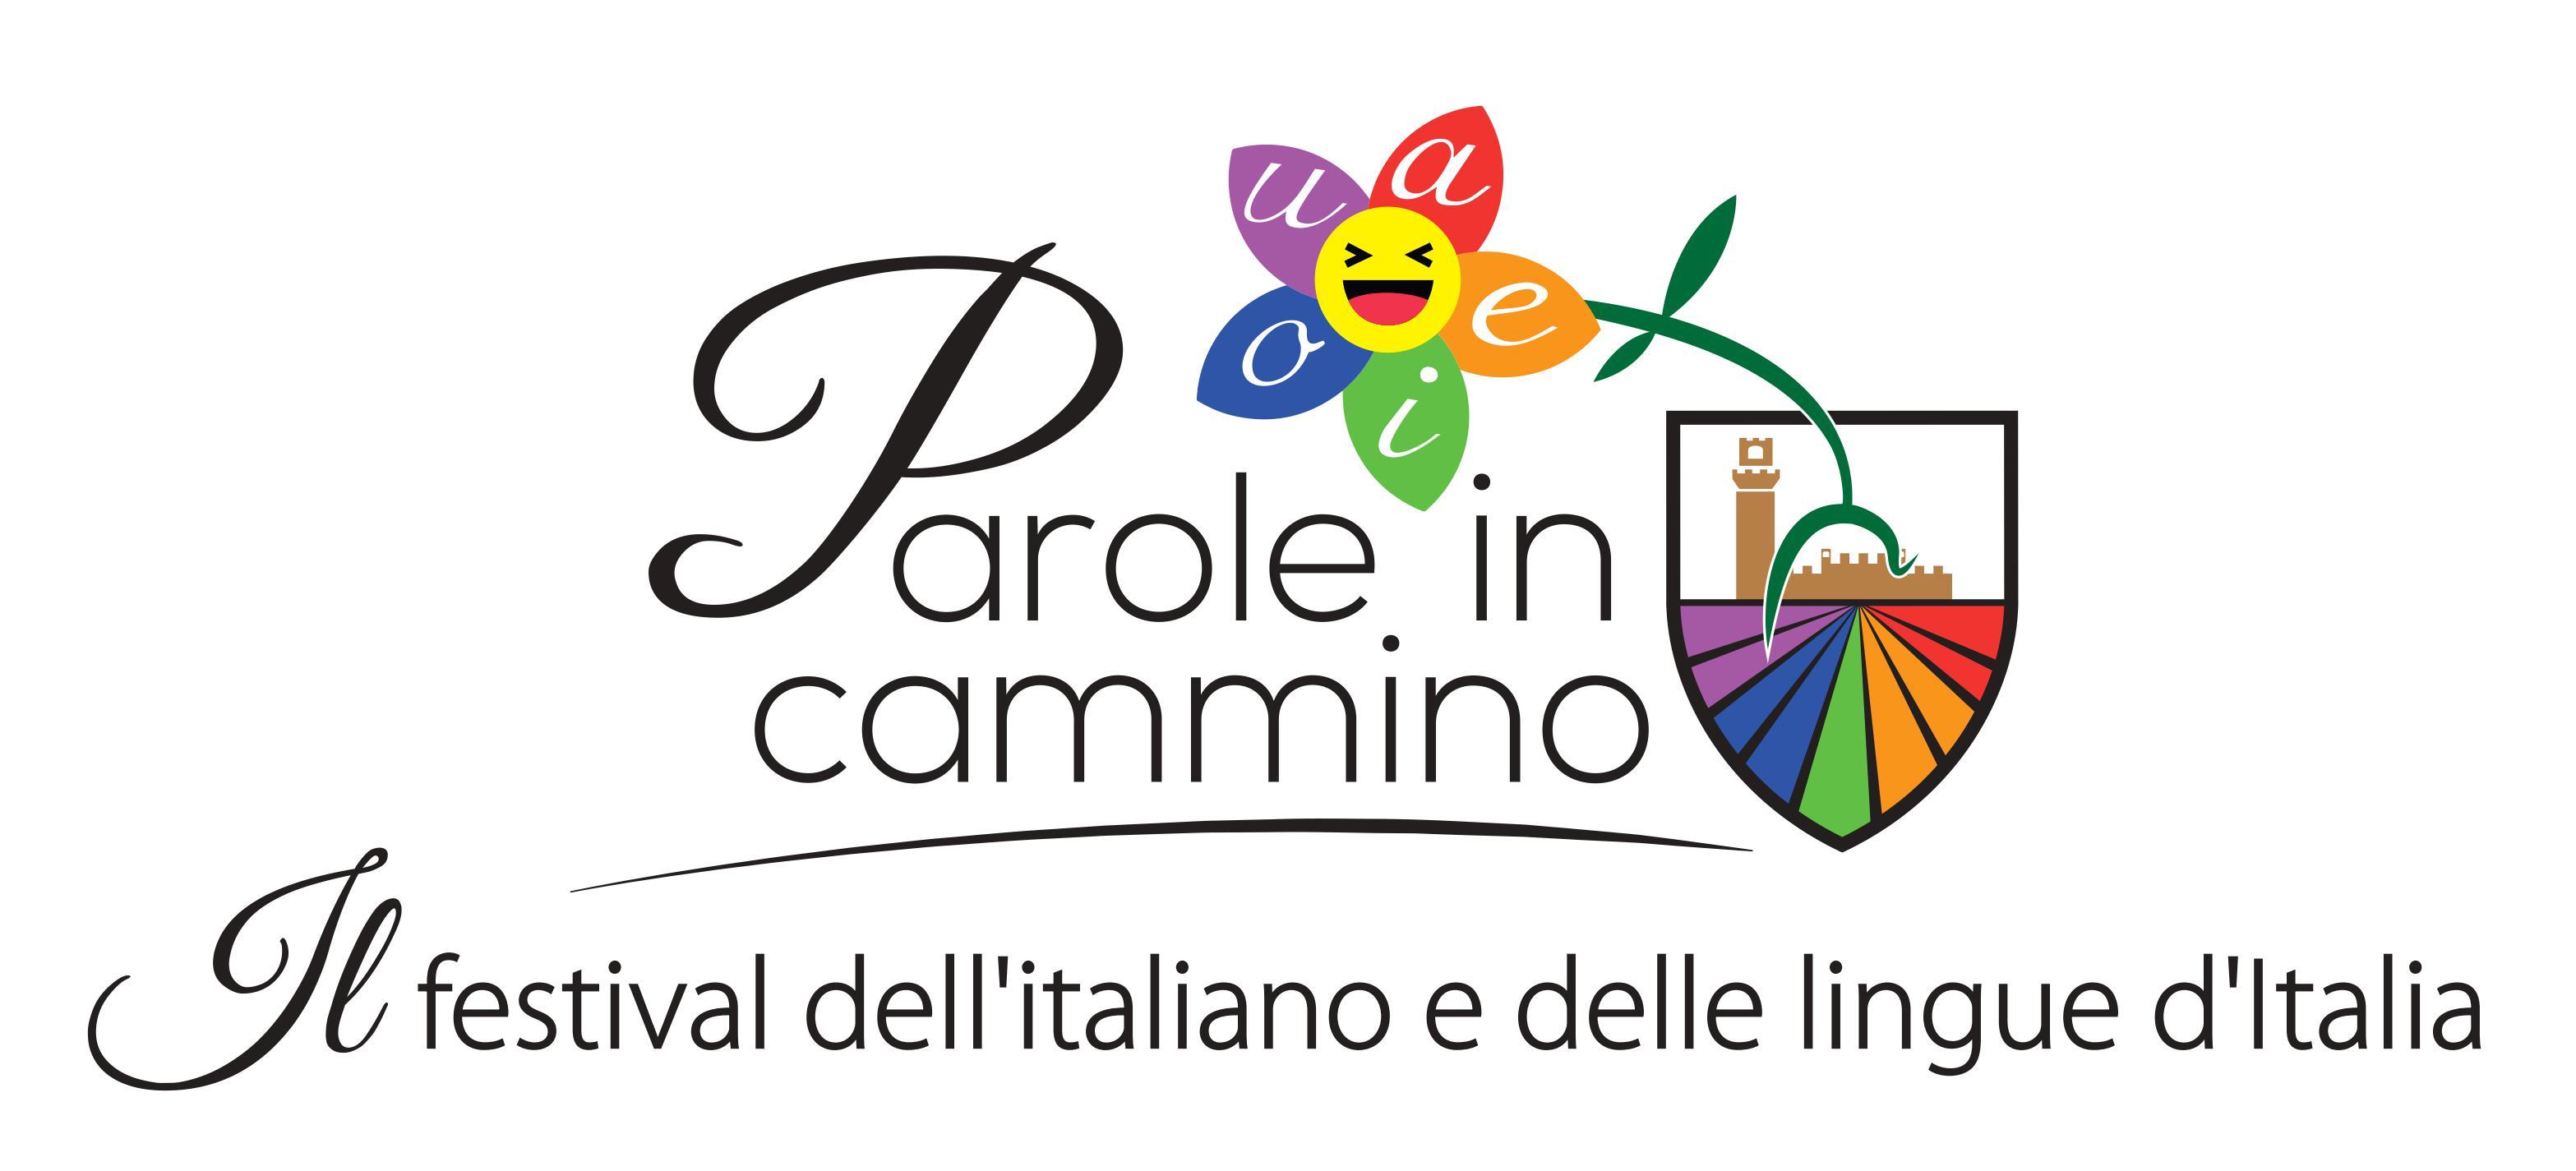 09/04/2017 - Siena, Teatro dei Rinnovati